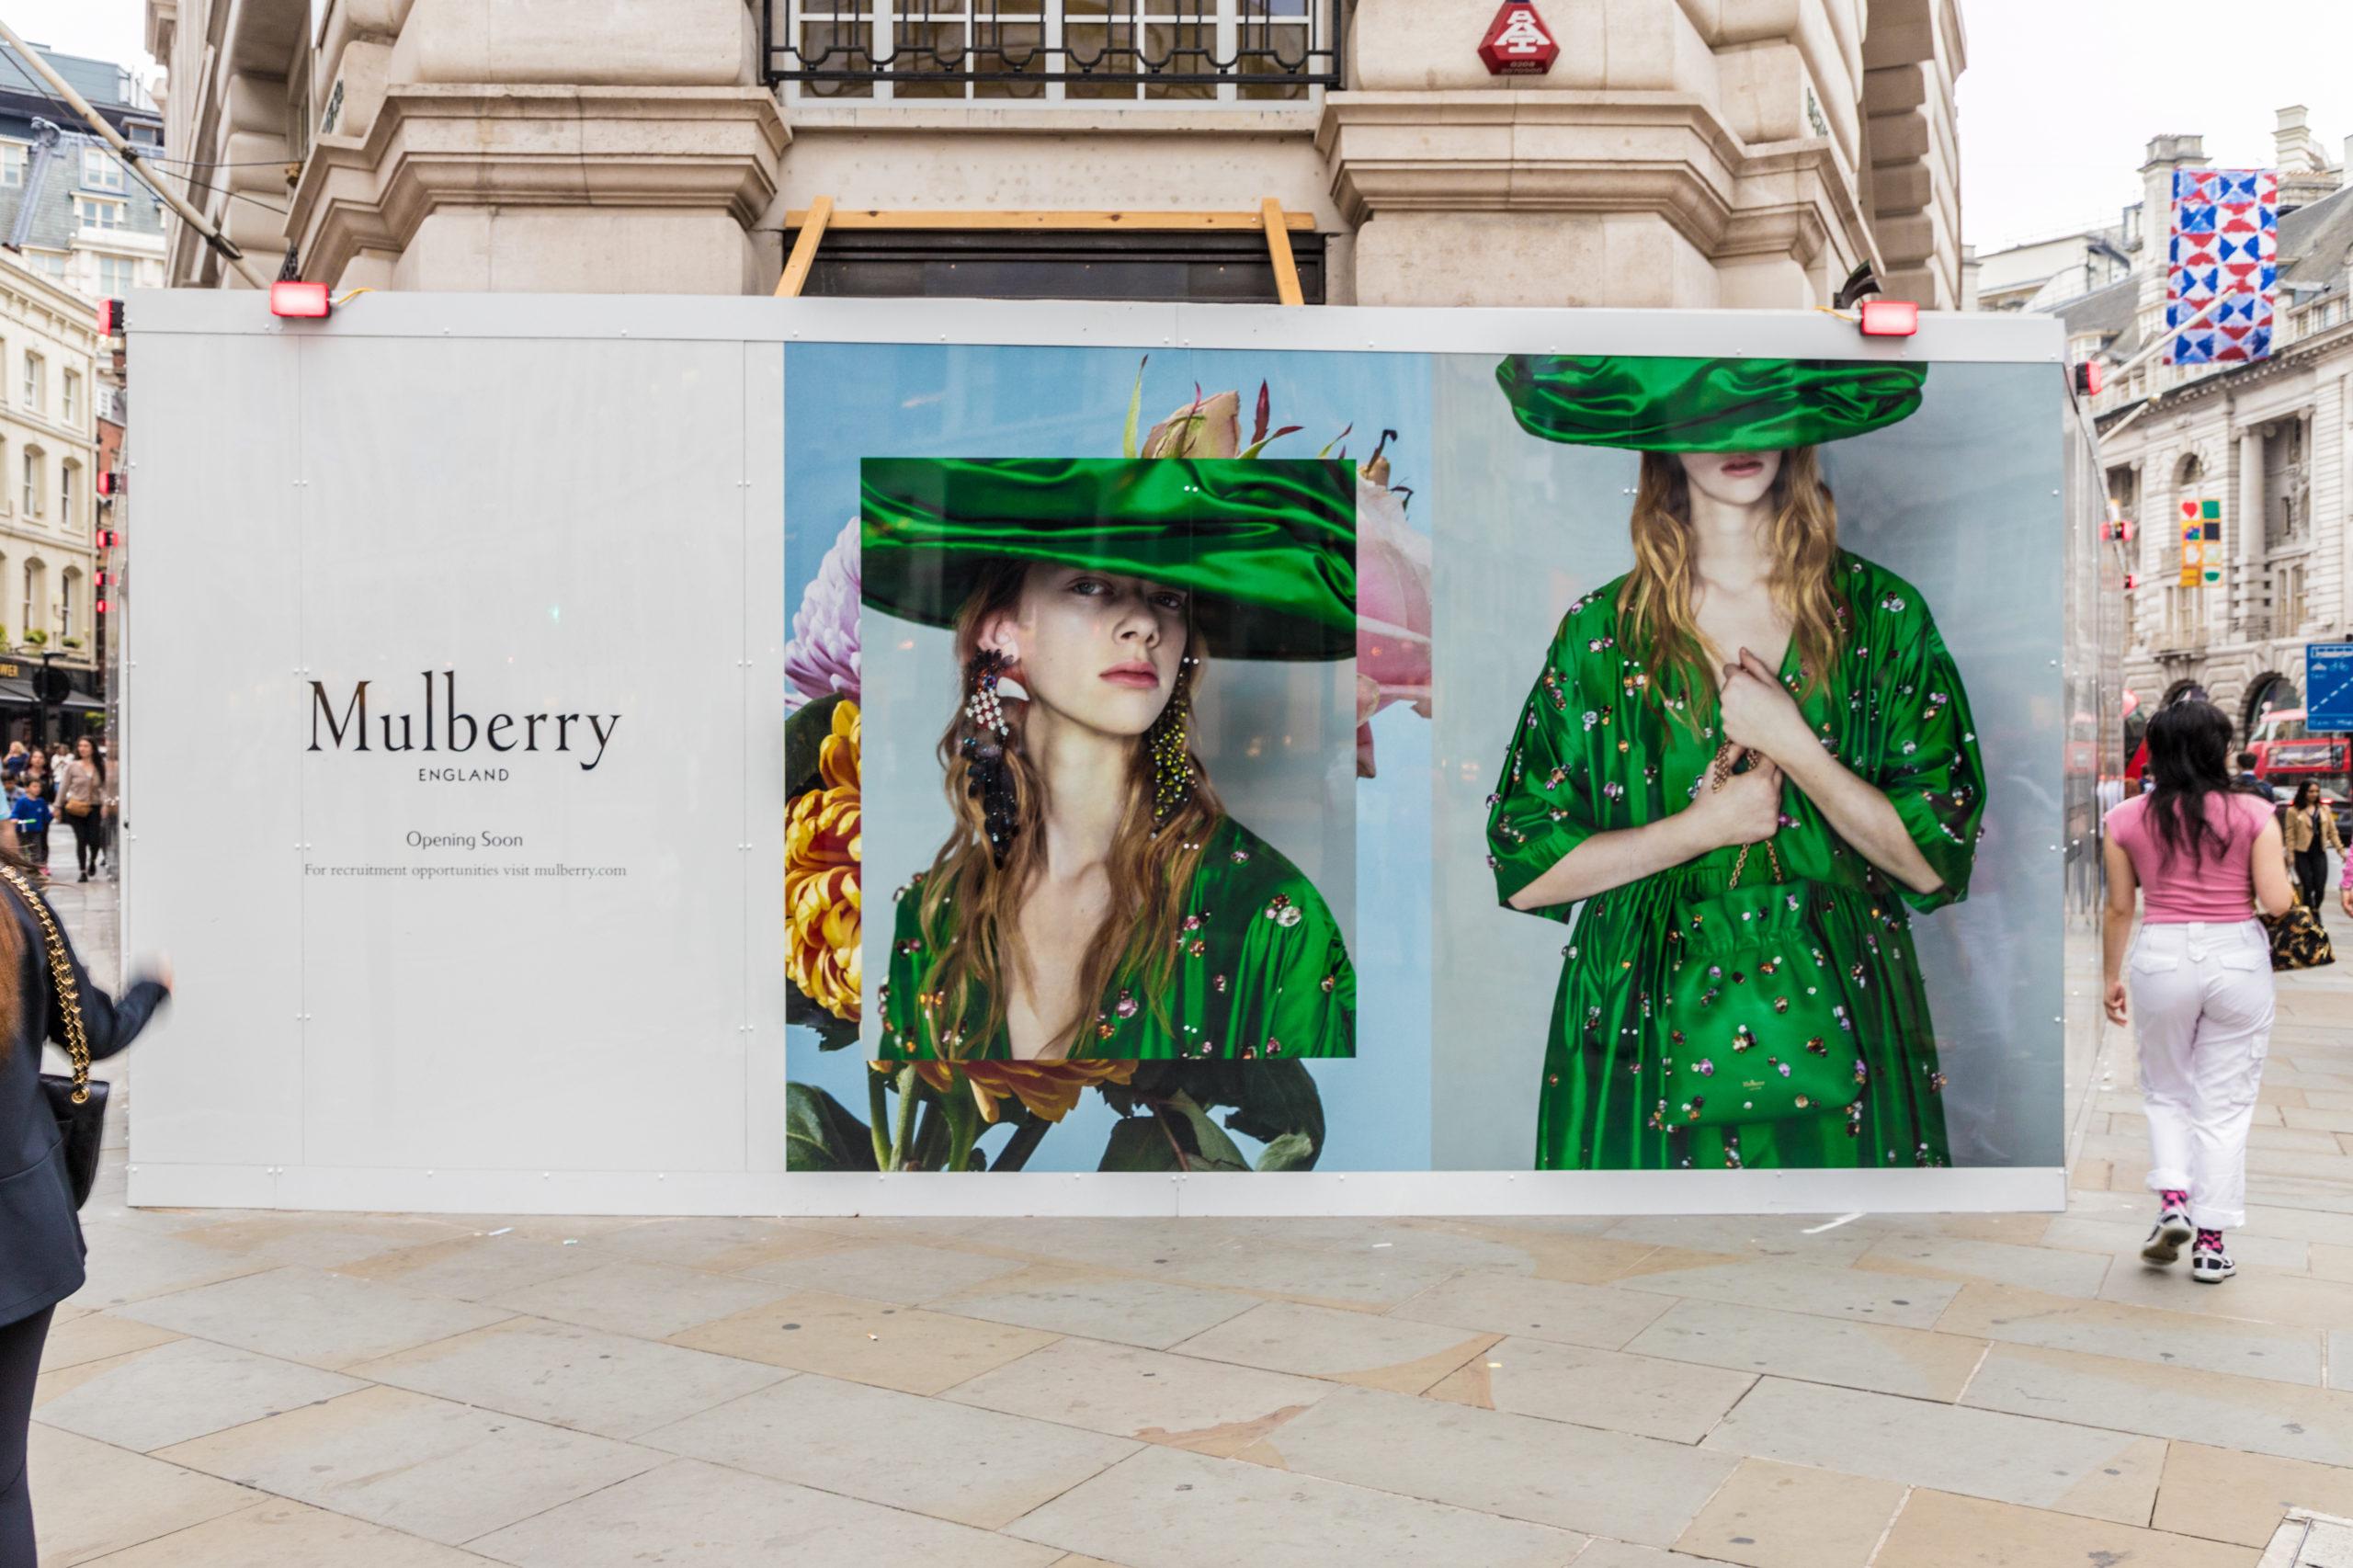 LA view of wooden hoarding advertising Mulberry on regent street in London